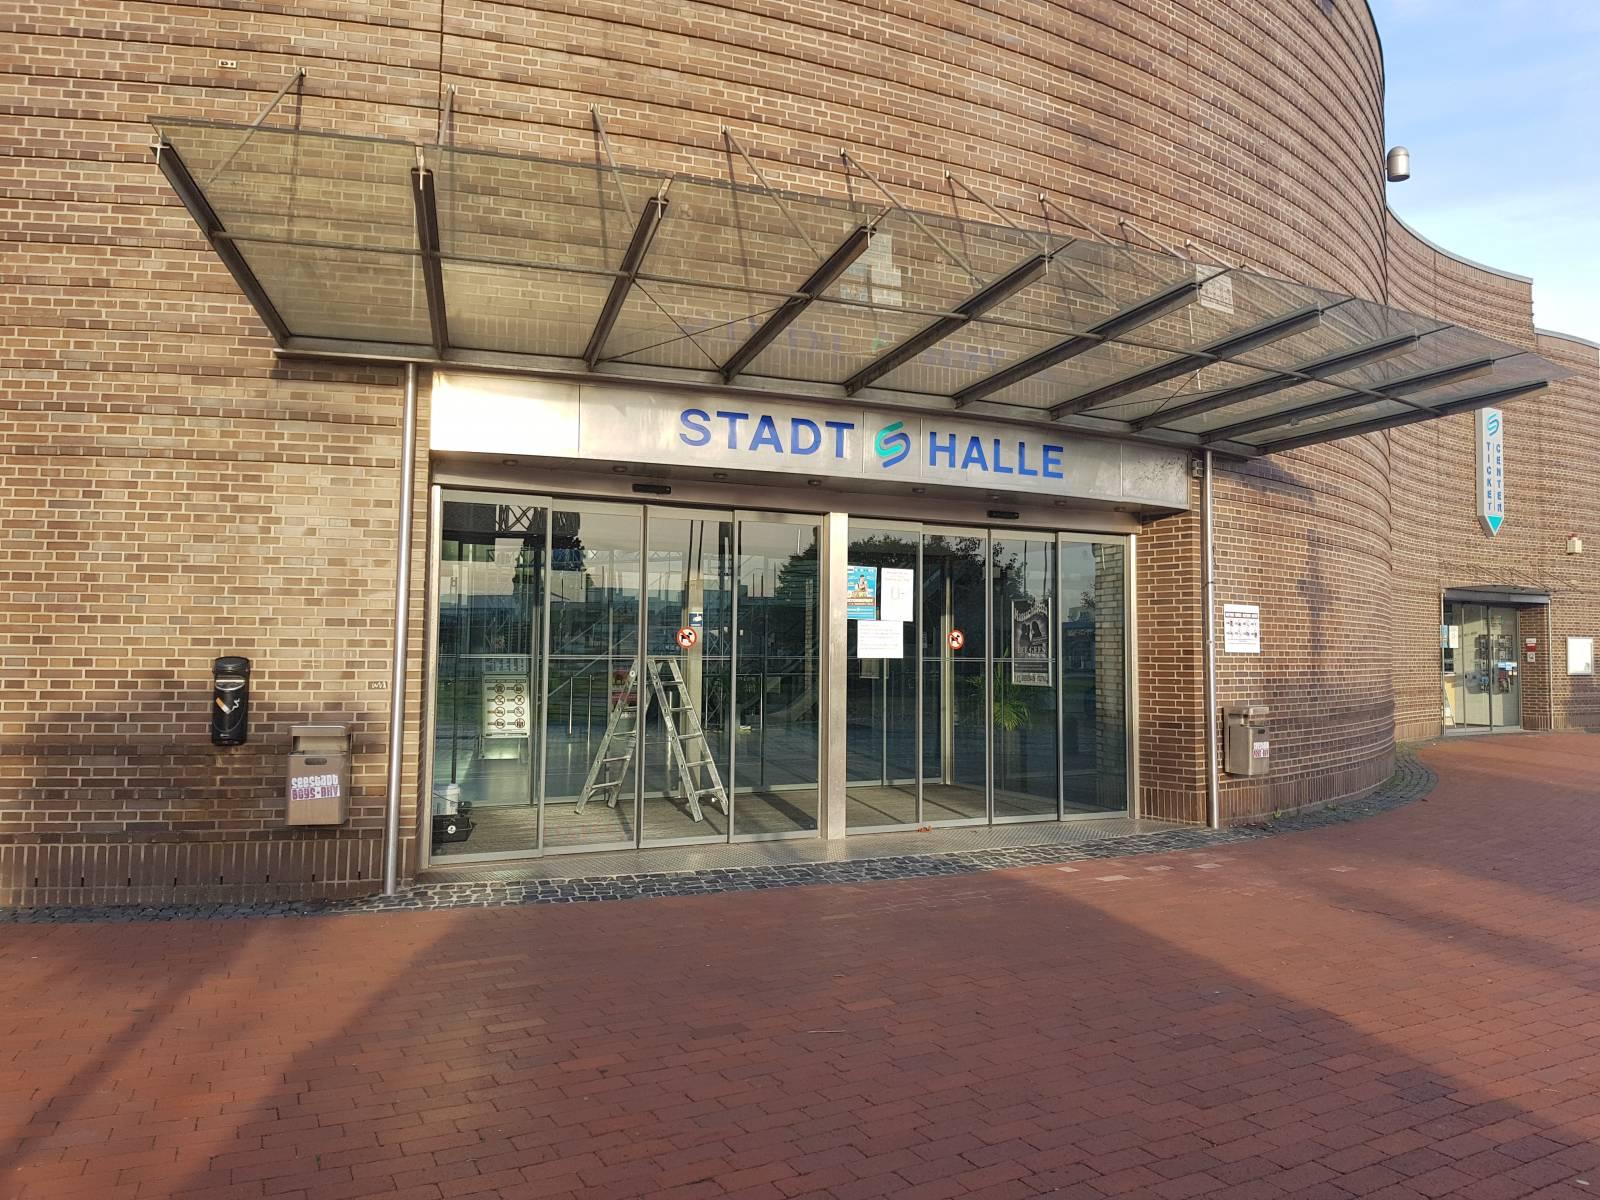 Stadthalle Bild 1